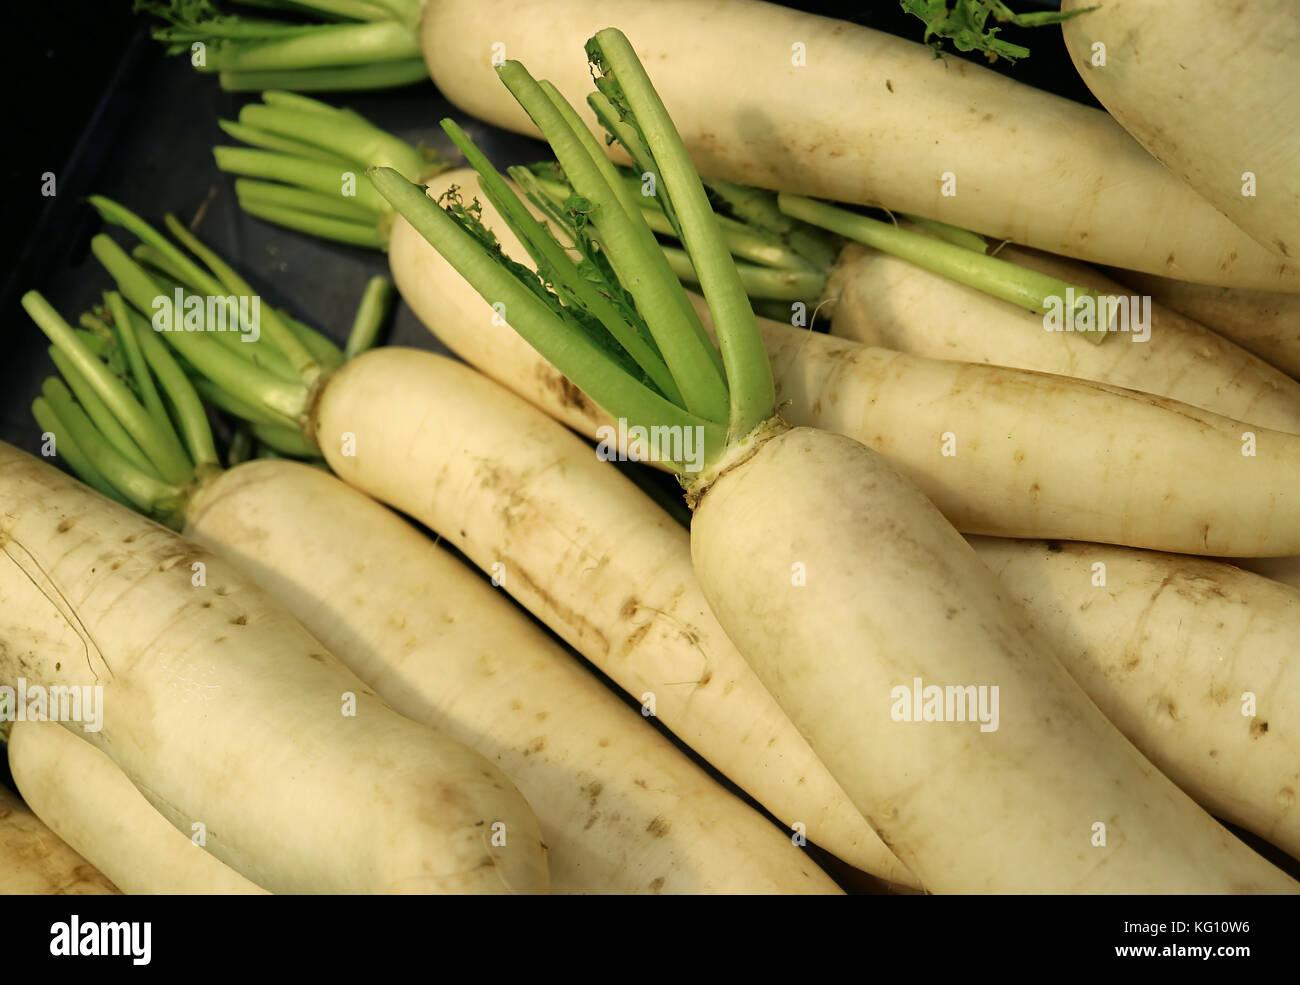 Heap of White Radish or Daikon Radish, with Selective Focus - Stock Image